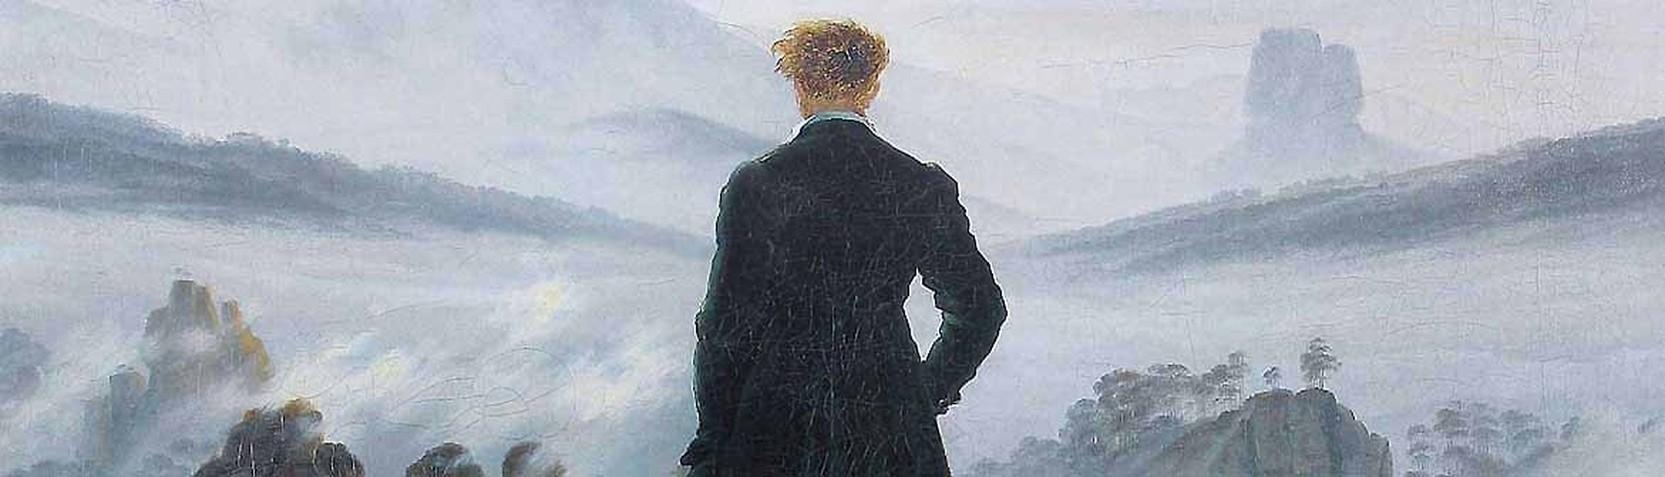 Artisti - Caspar David Friedrich